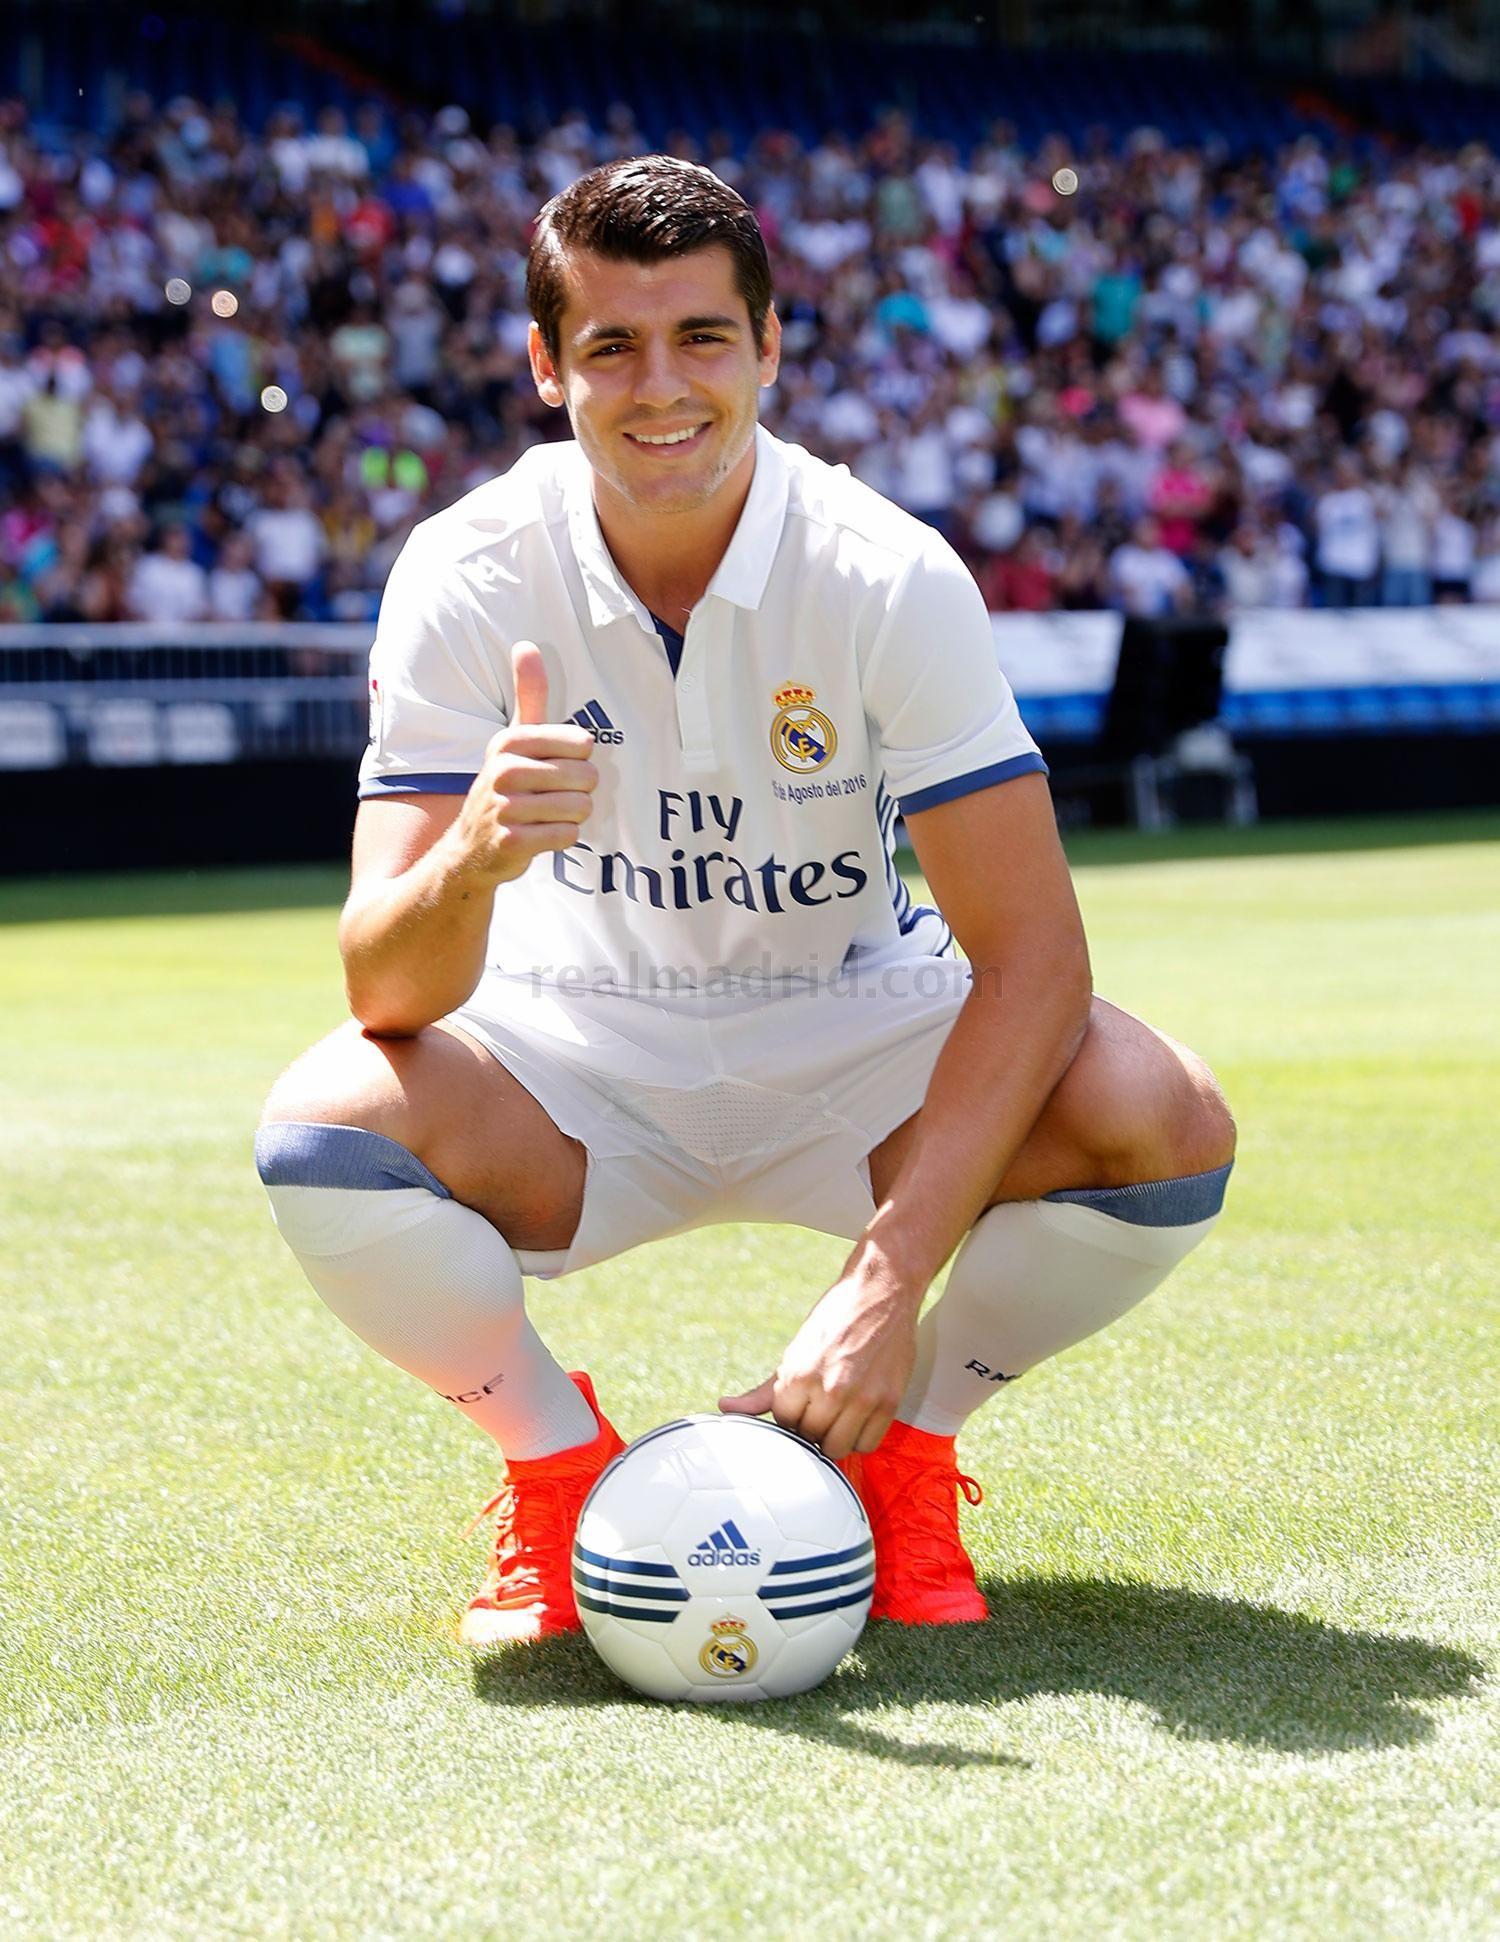 Real Madrid Cf Web Oficial Del Real Madrid Cf Real Madrid álvaro Morata Madrid